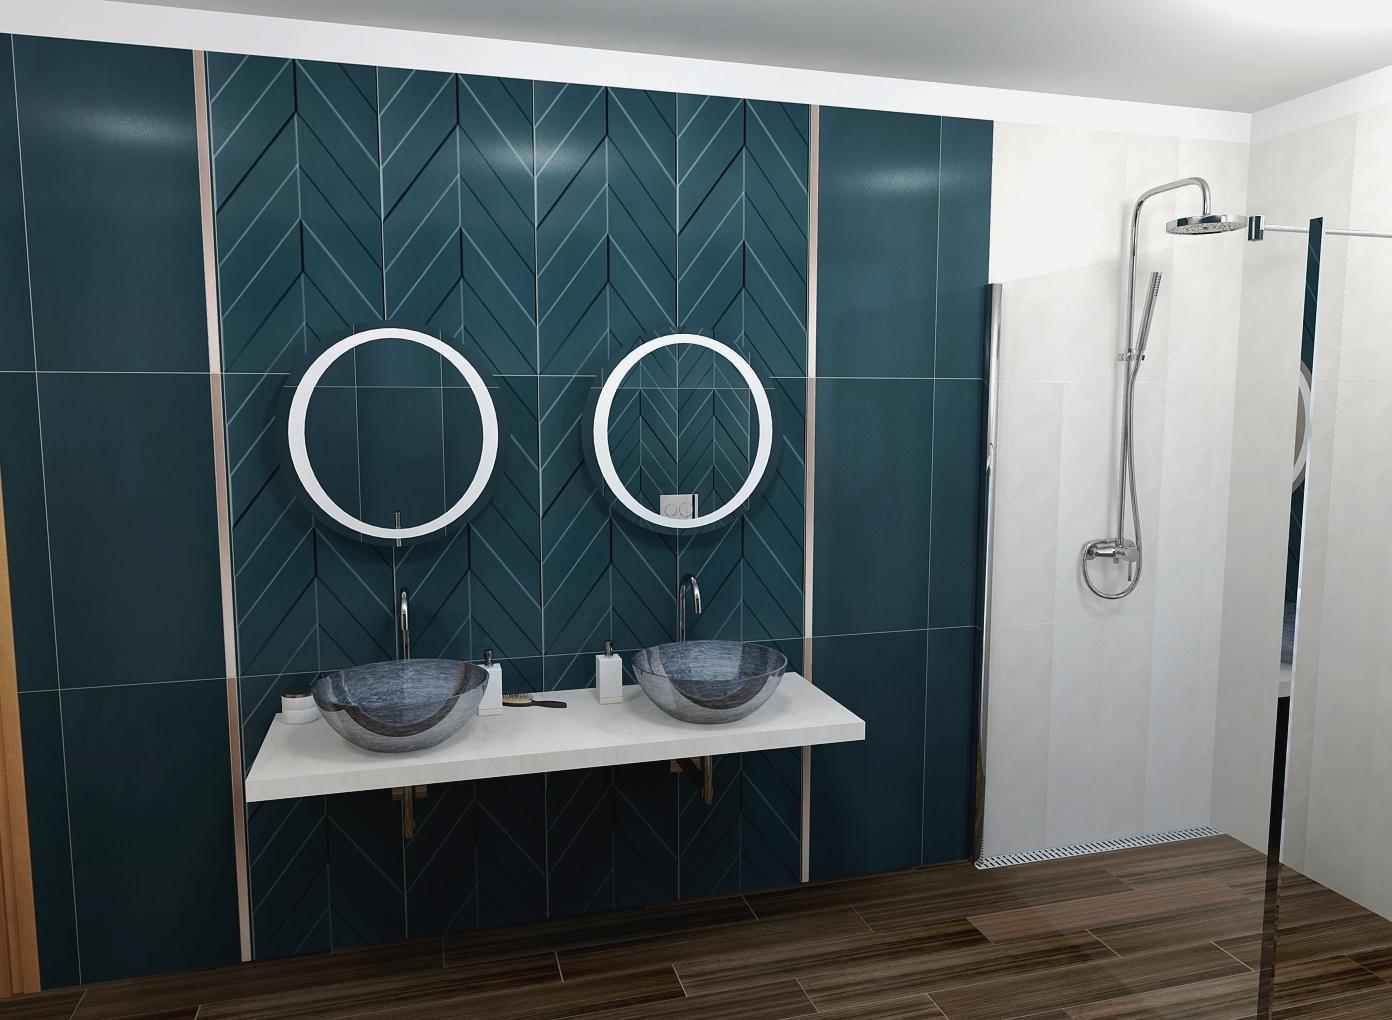 marca corona 4d bathroom by ujhazbudapest on visoft360. Black Bedroom Furniture Sets. Home Design Ideas